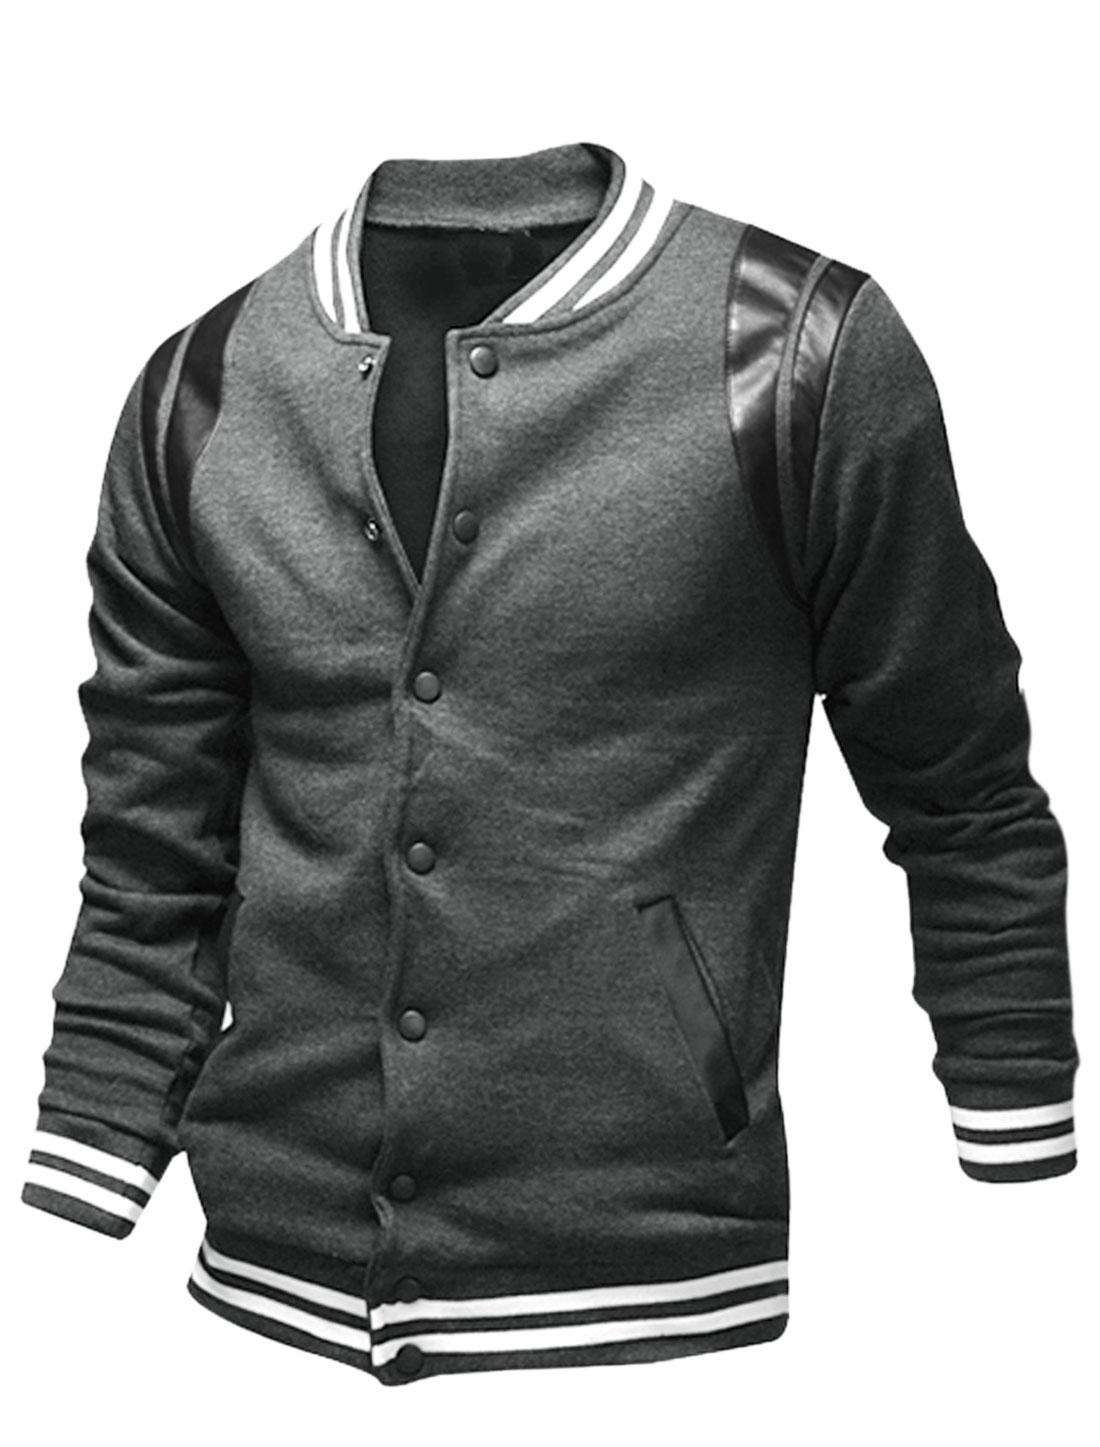 Men Imitation Leather Panel Detail Snap Button Closed Varsity Jacket Gray M